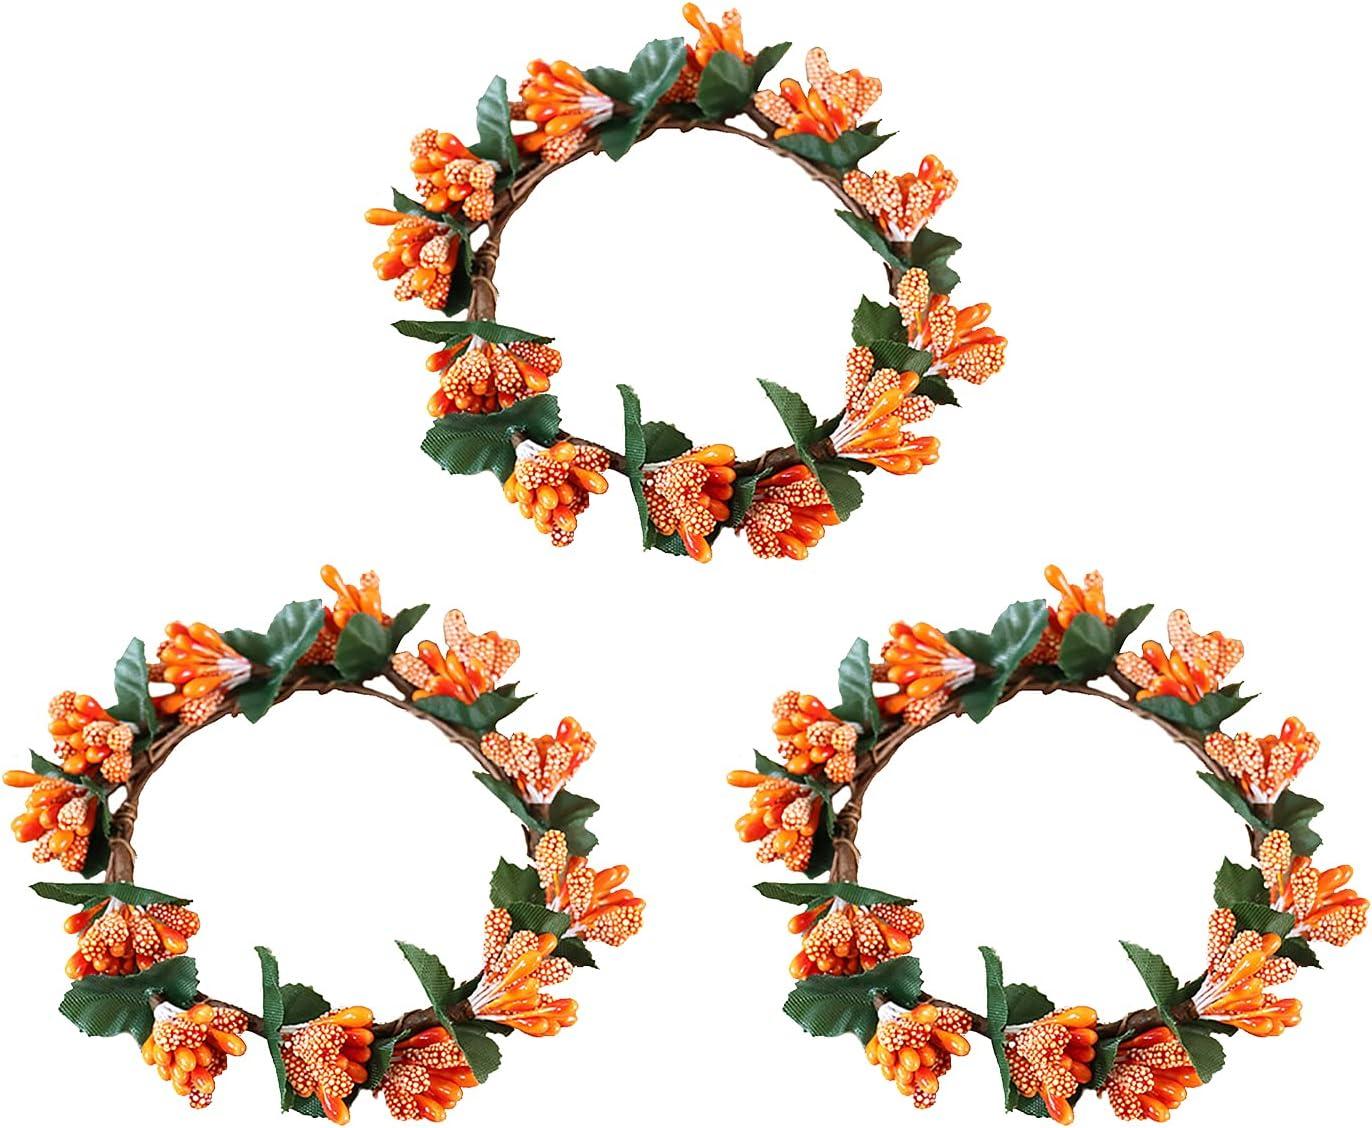 KHBNHJ 3 Pcs Quantity limited Miami Mall Fall Candle Rings Wreath Taper Decorative C 3.1inch